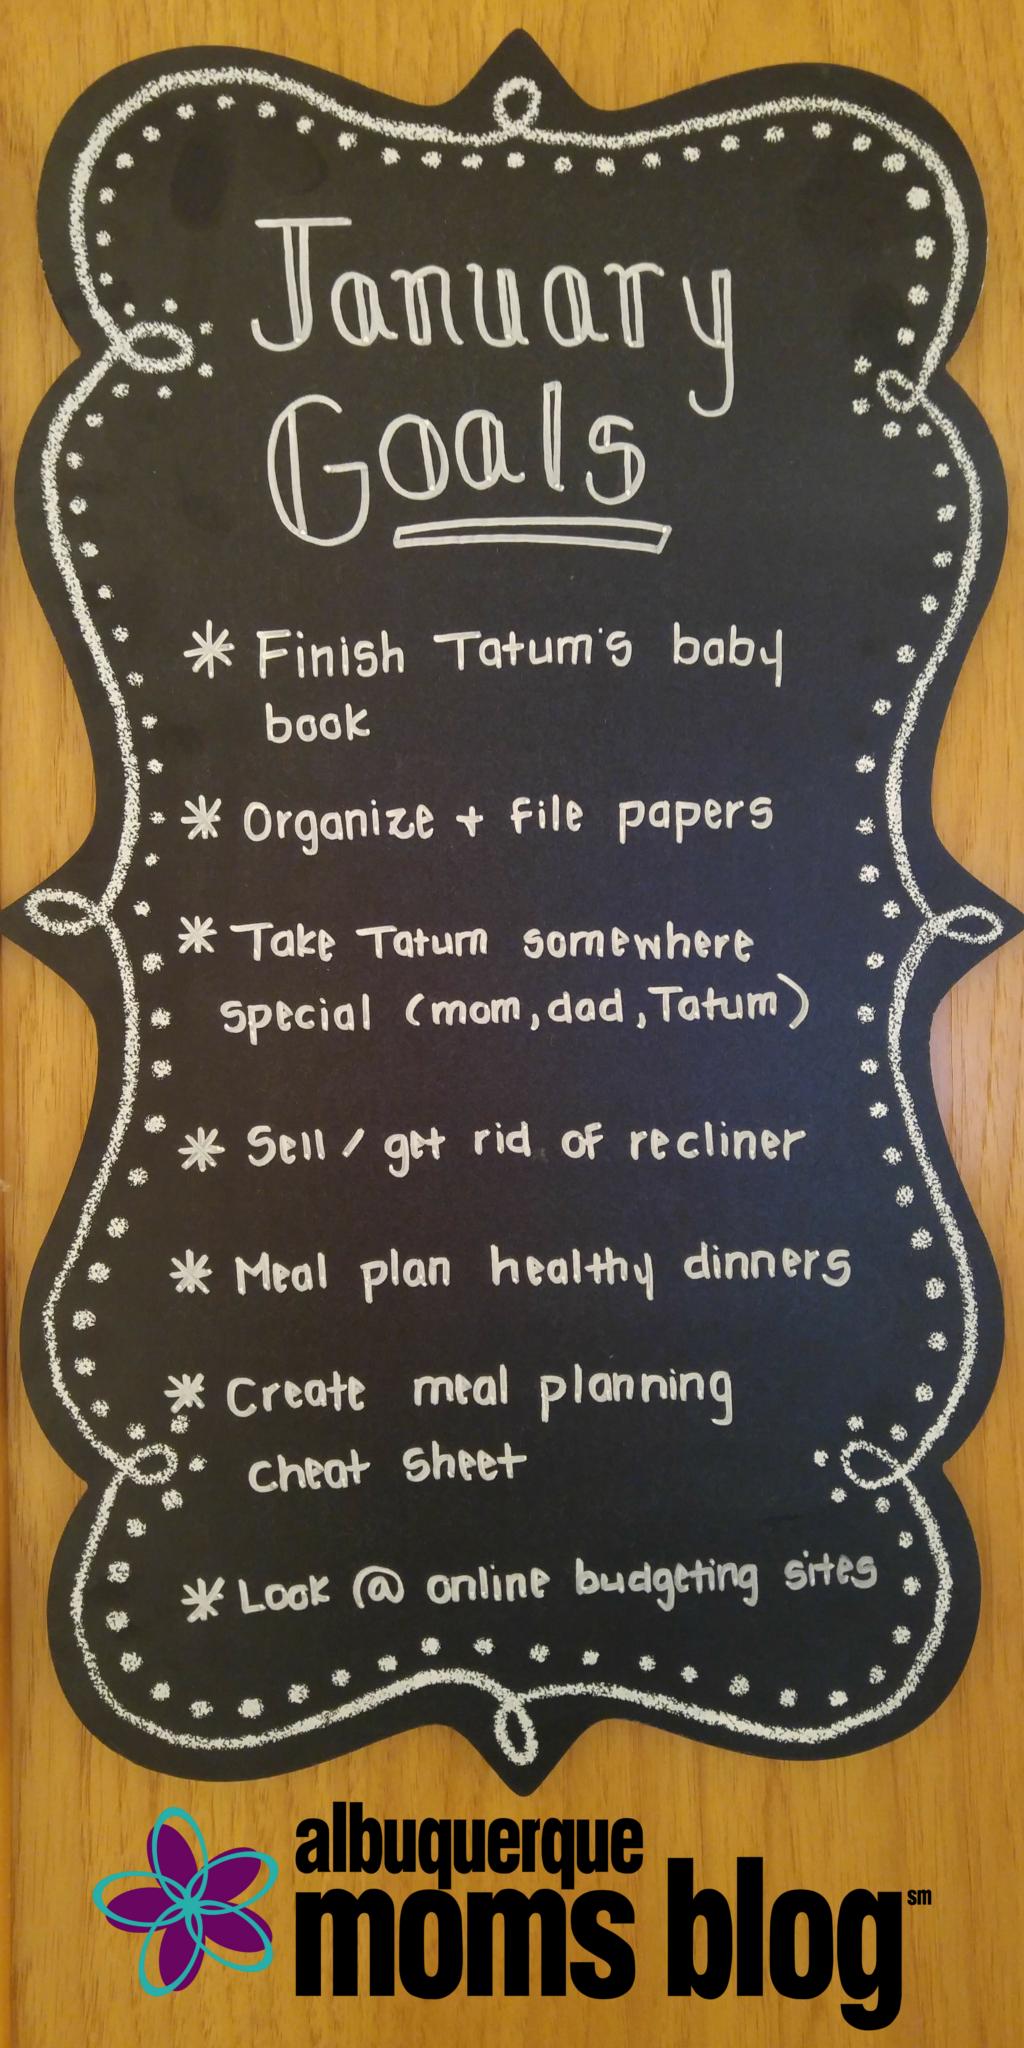 Monthly-Goals-Board-Albuquerque-Moms-Blog